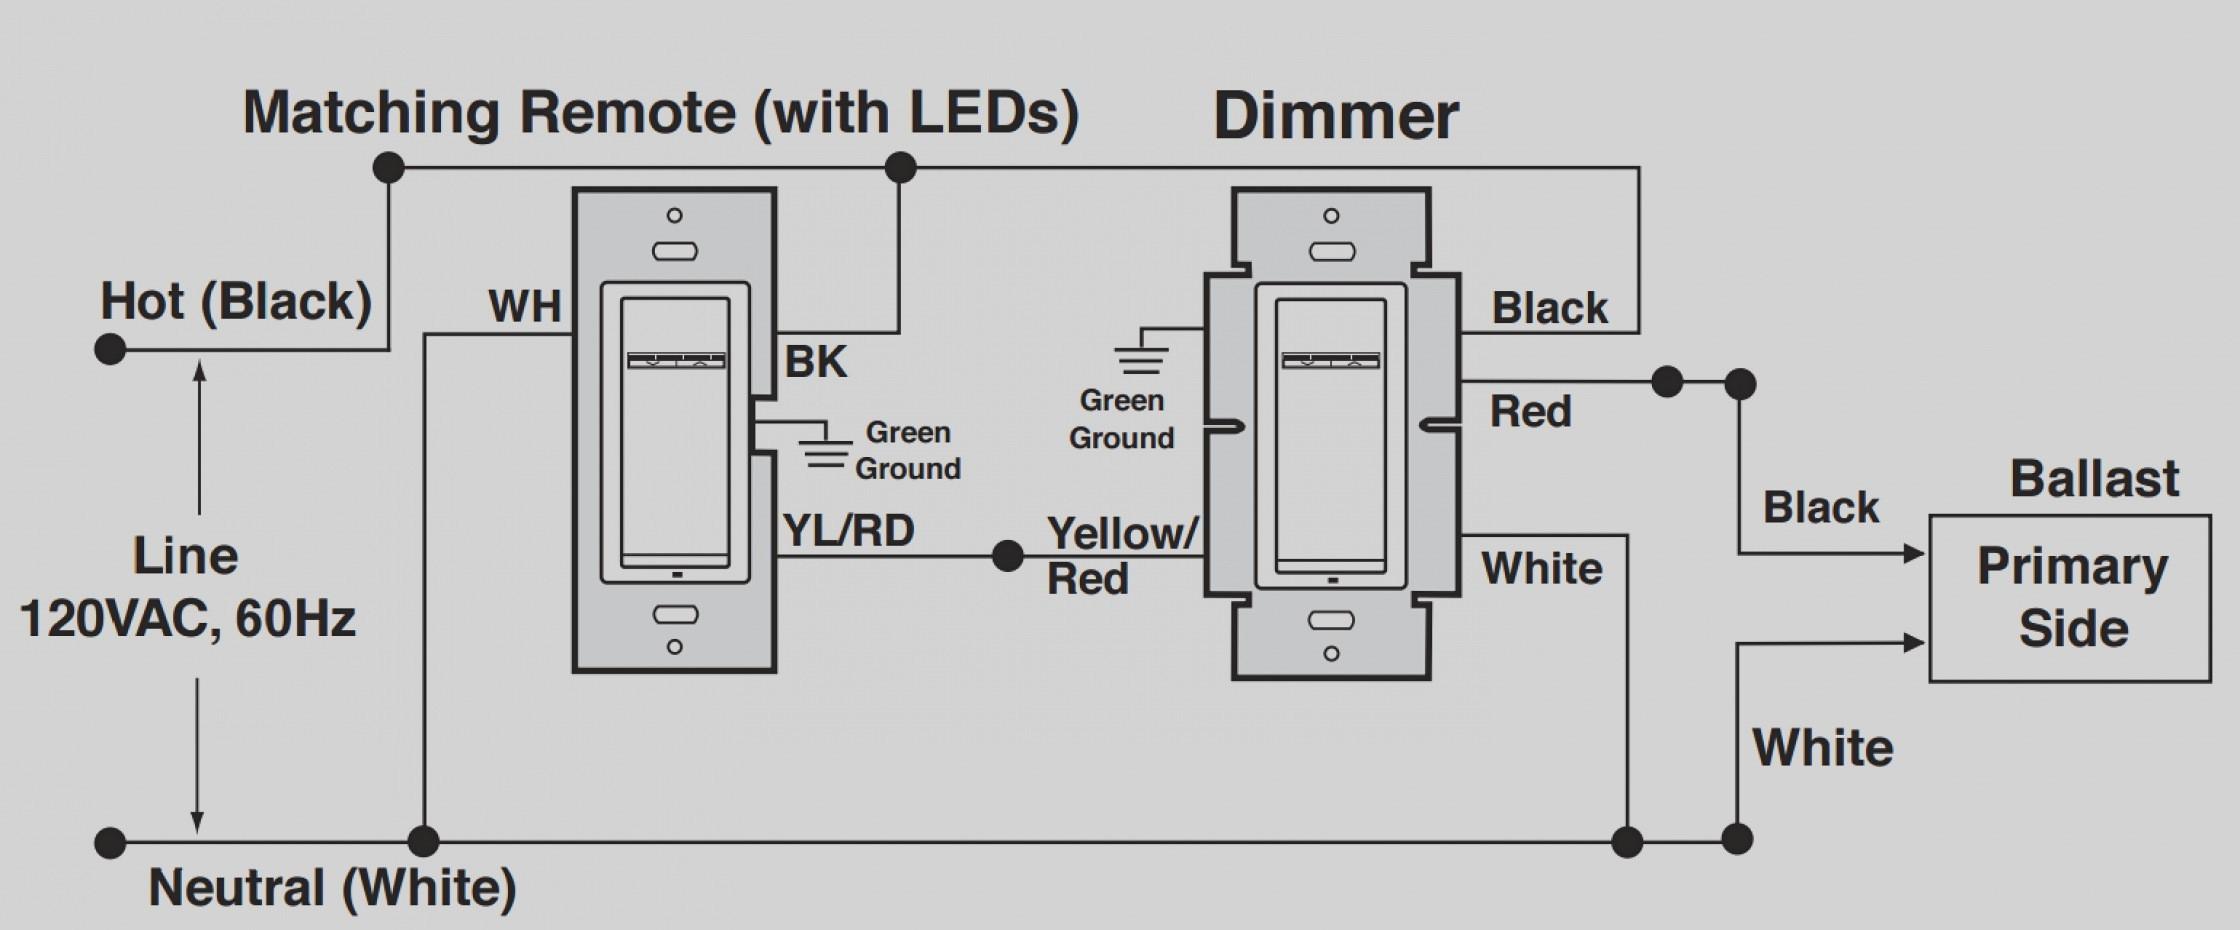 Jasco Z Wave Dimmer 3 Way Wiring Diagram - Wiring Diagrams on